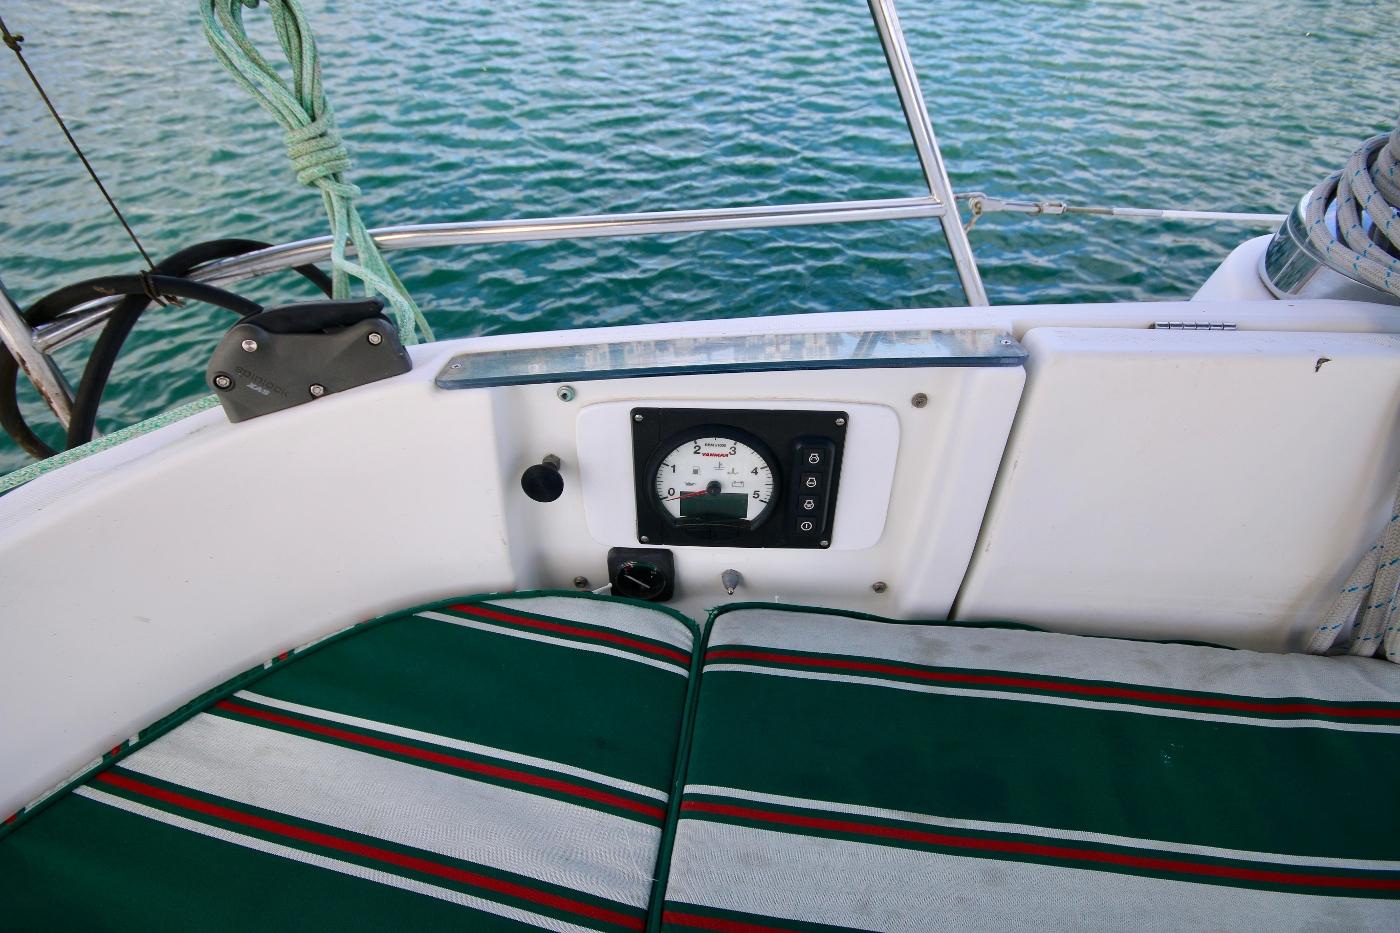 1997 Beneteau Oceanis 461, Engine control panel